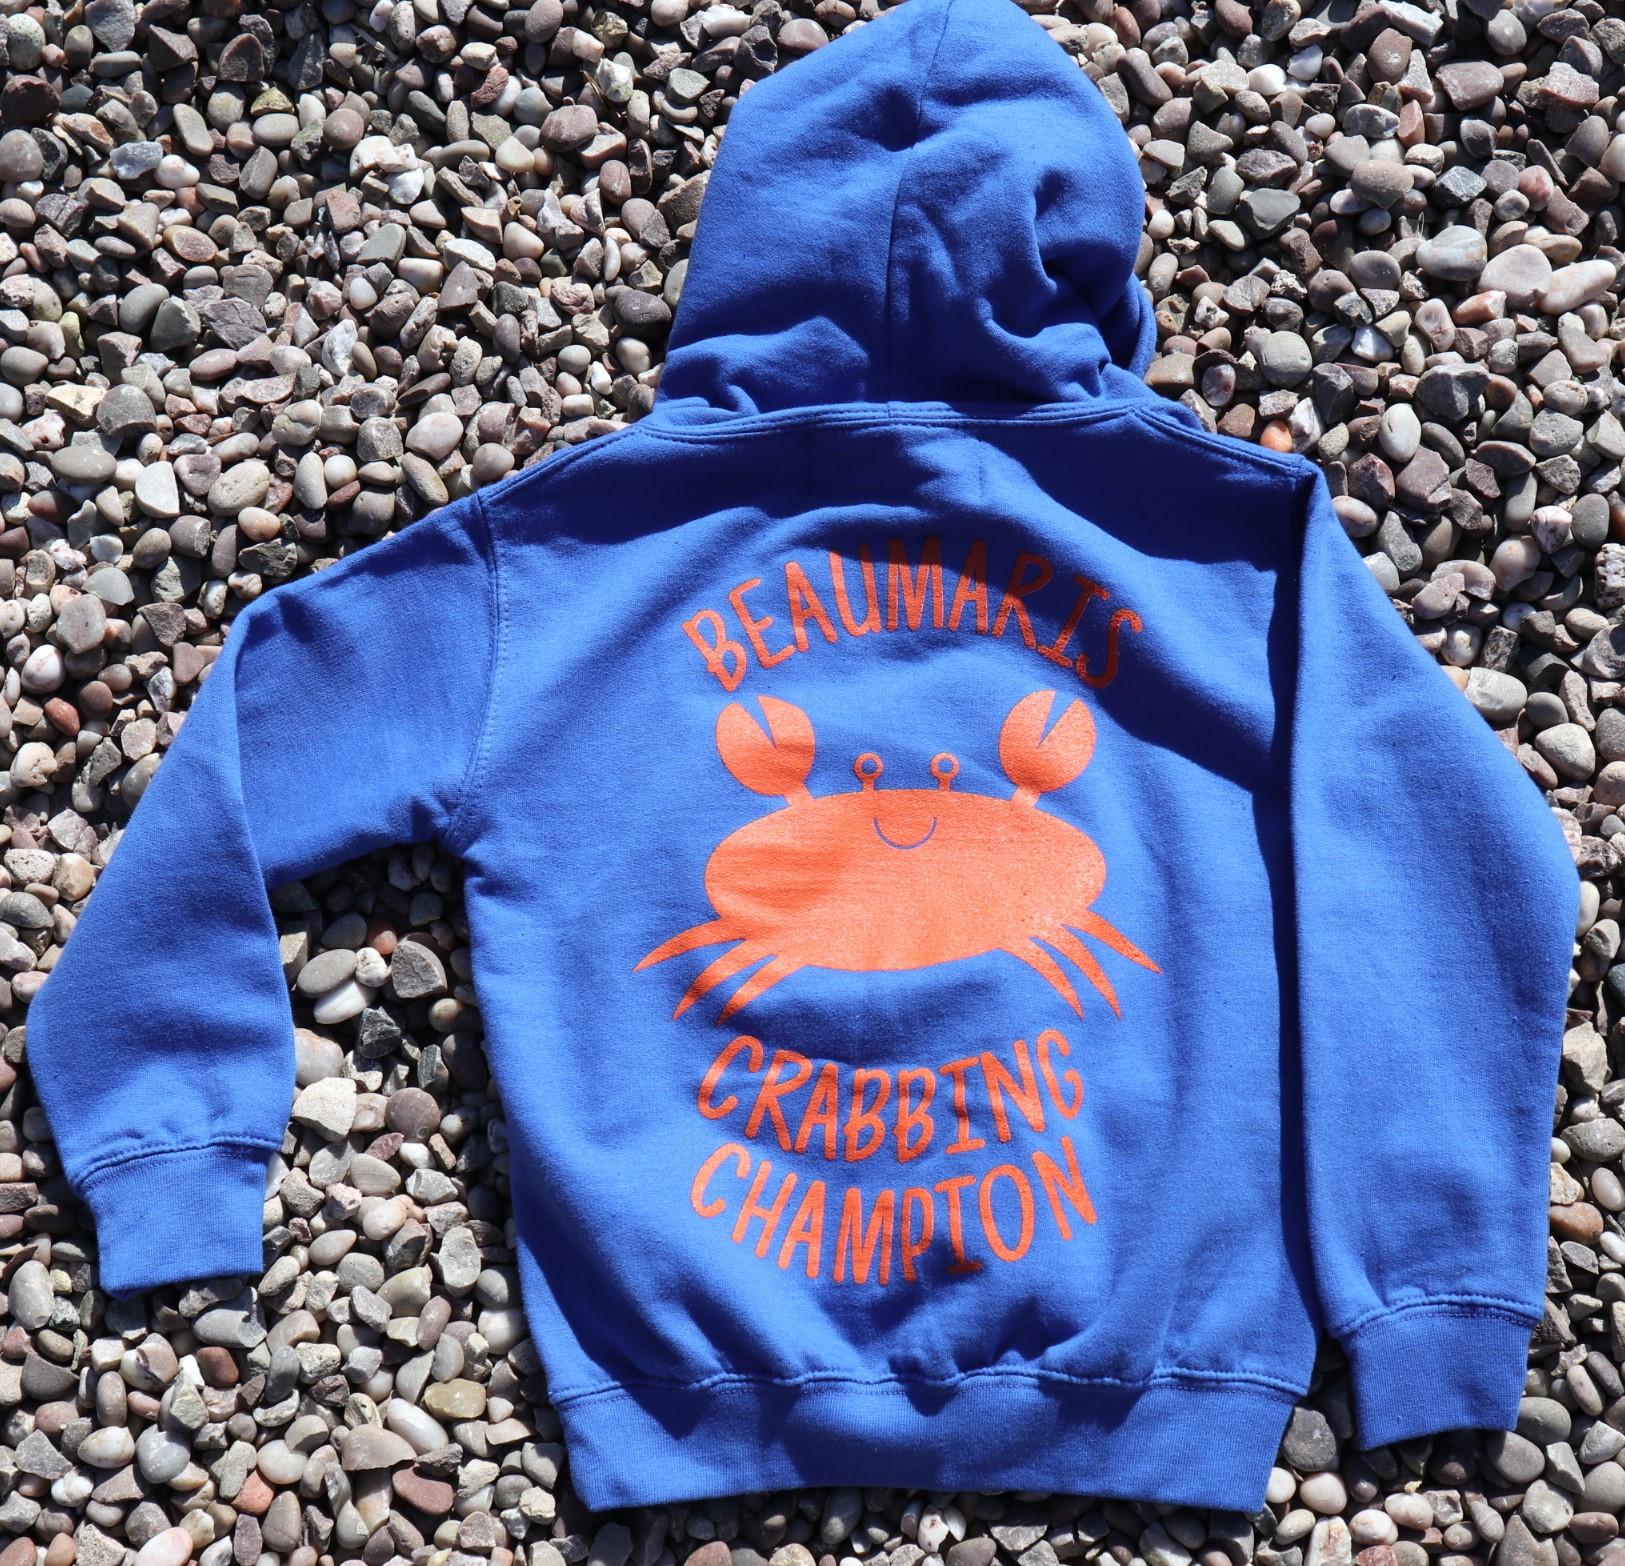 Kids Beaumaris crabbing champion hoody blue